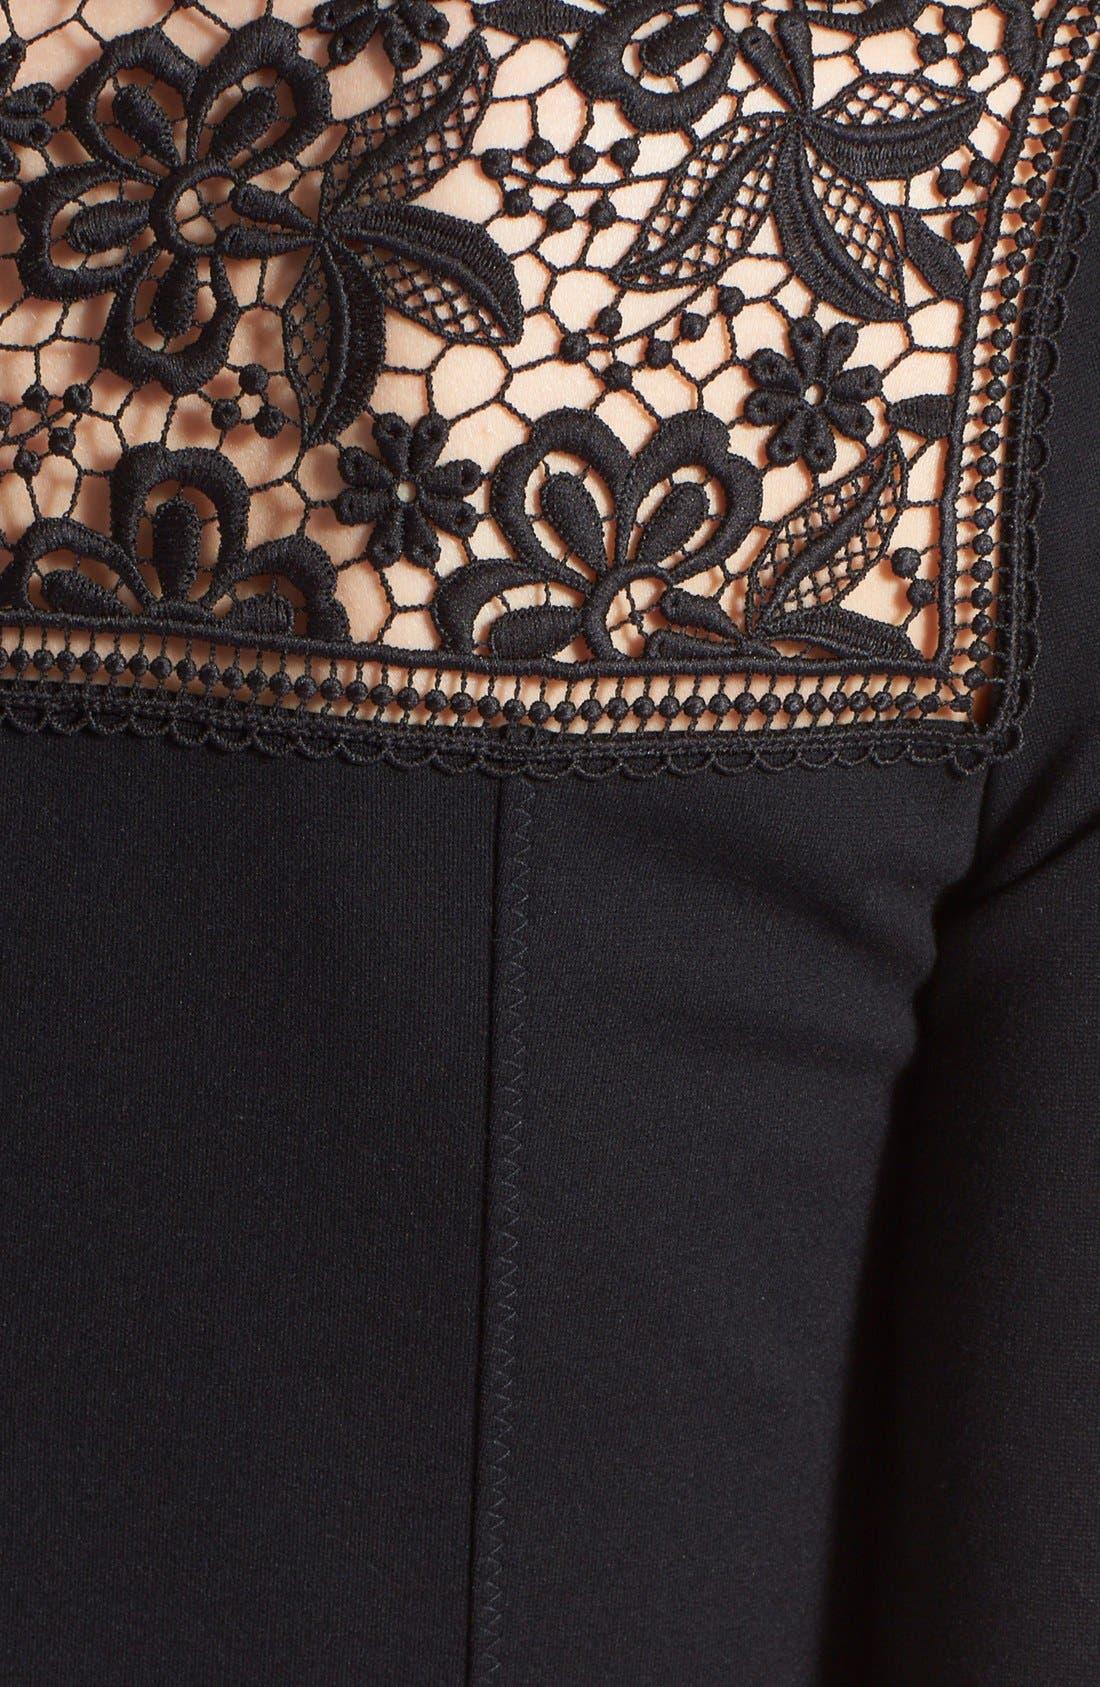 'Rieko' Lace Inset Jersey Dress,                             Alternate thumbnail 6, color,                             001